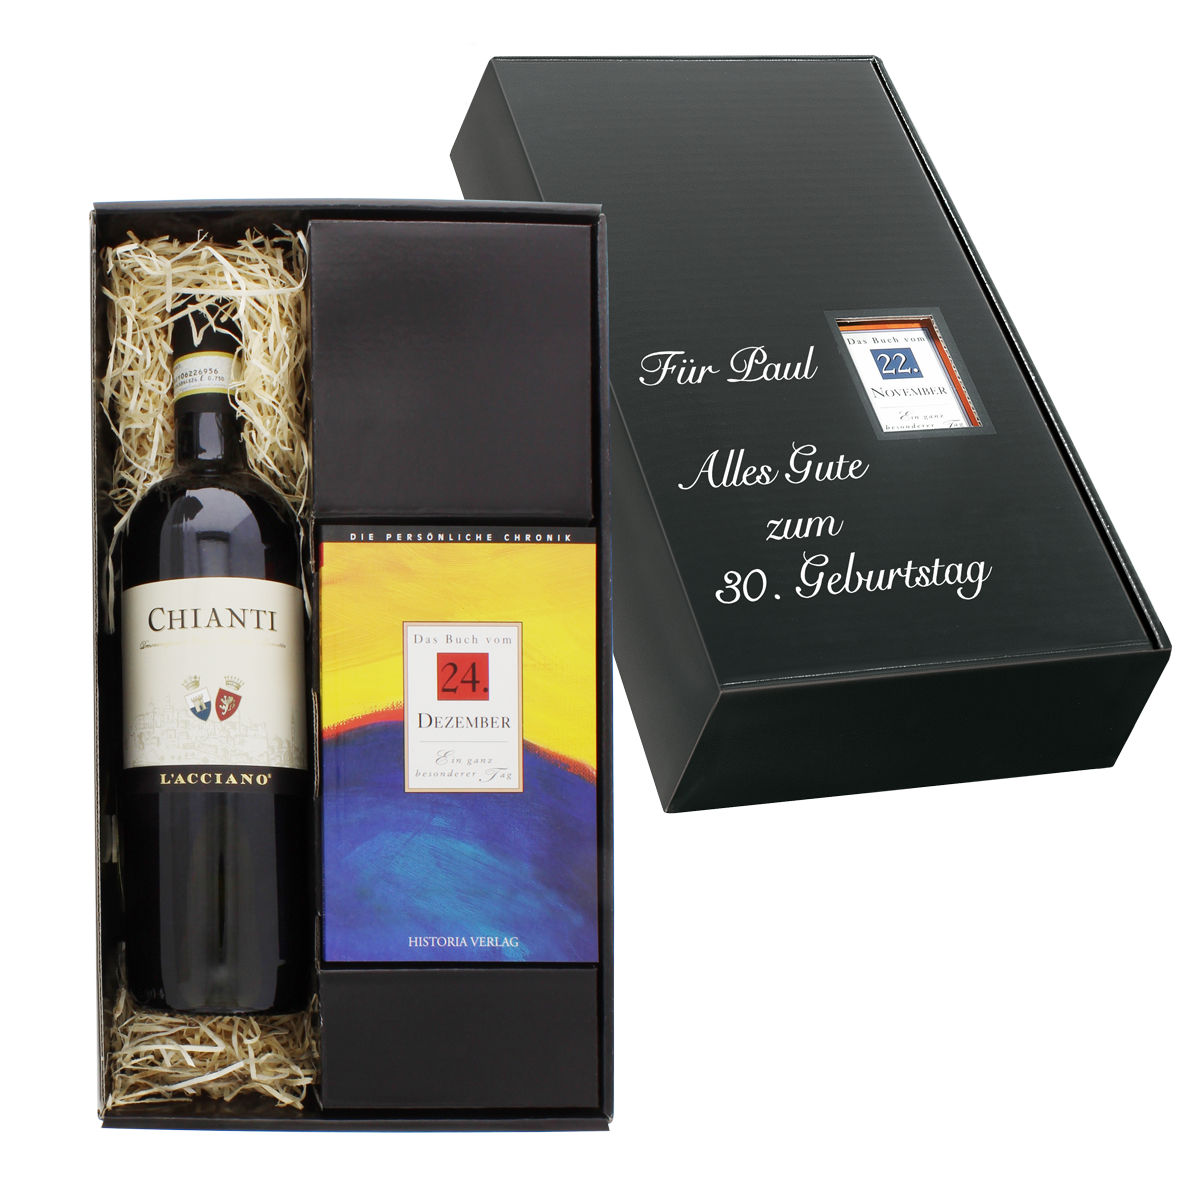 Italien-Set: Tageschronik vom 14. Januar & Chianti-Wein